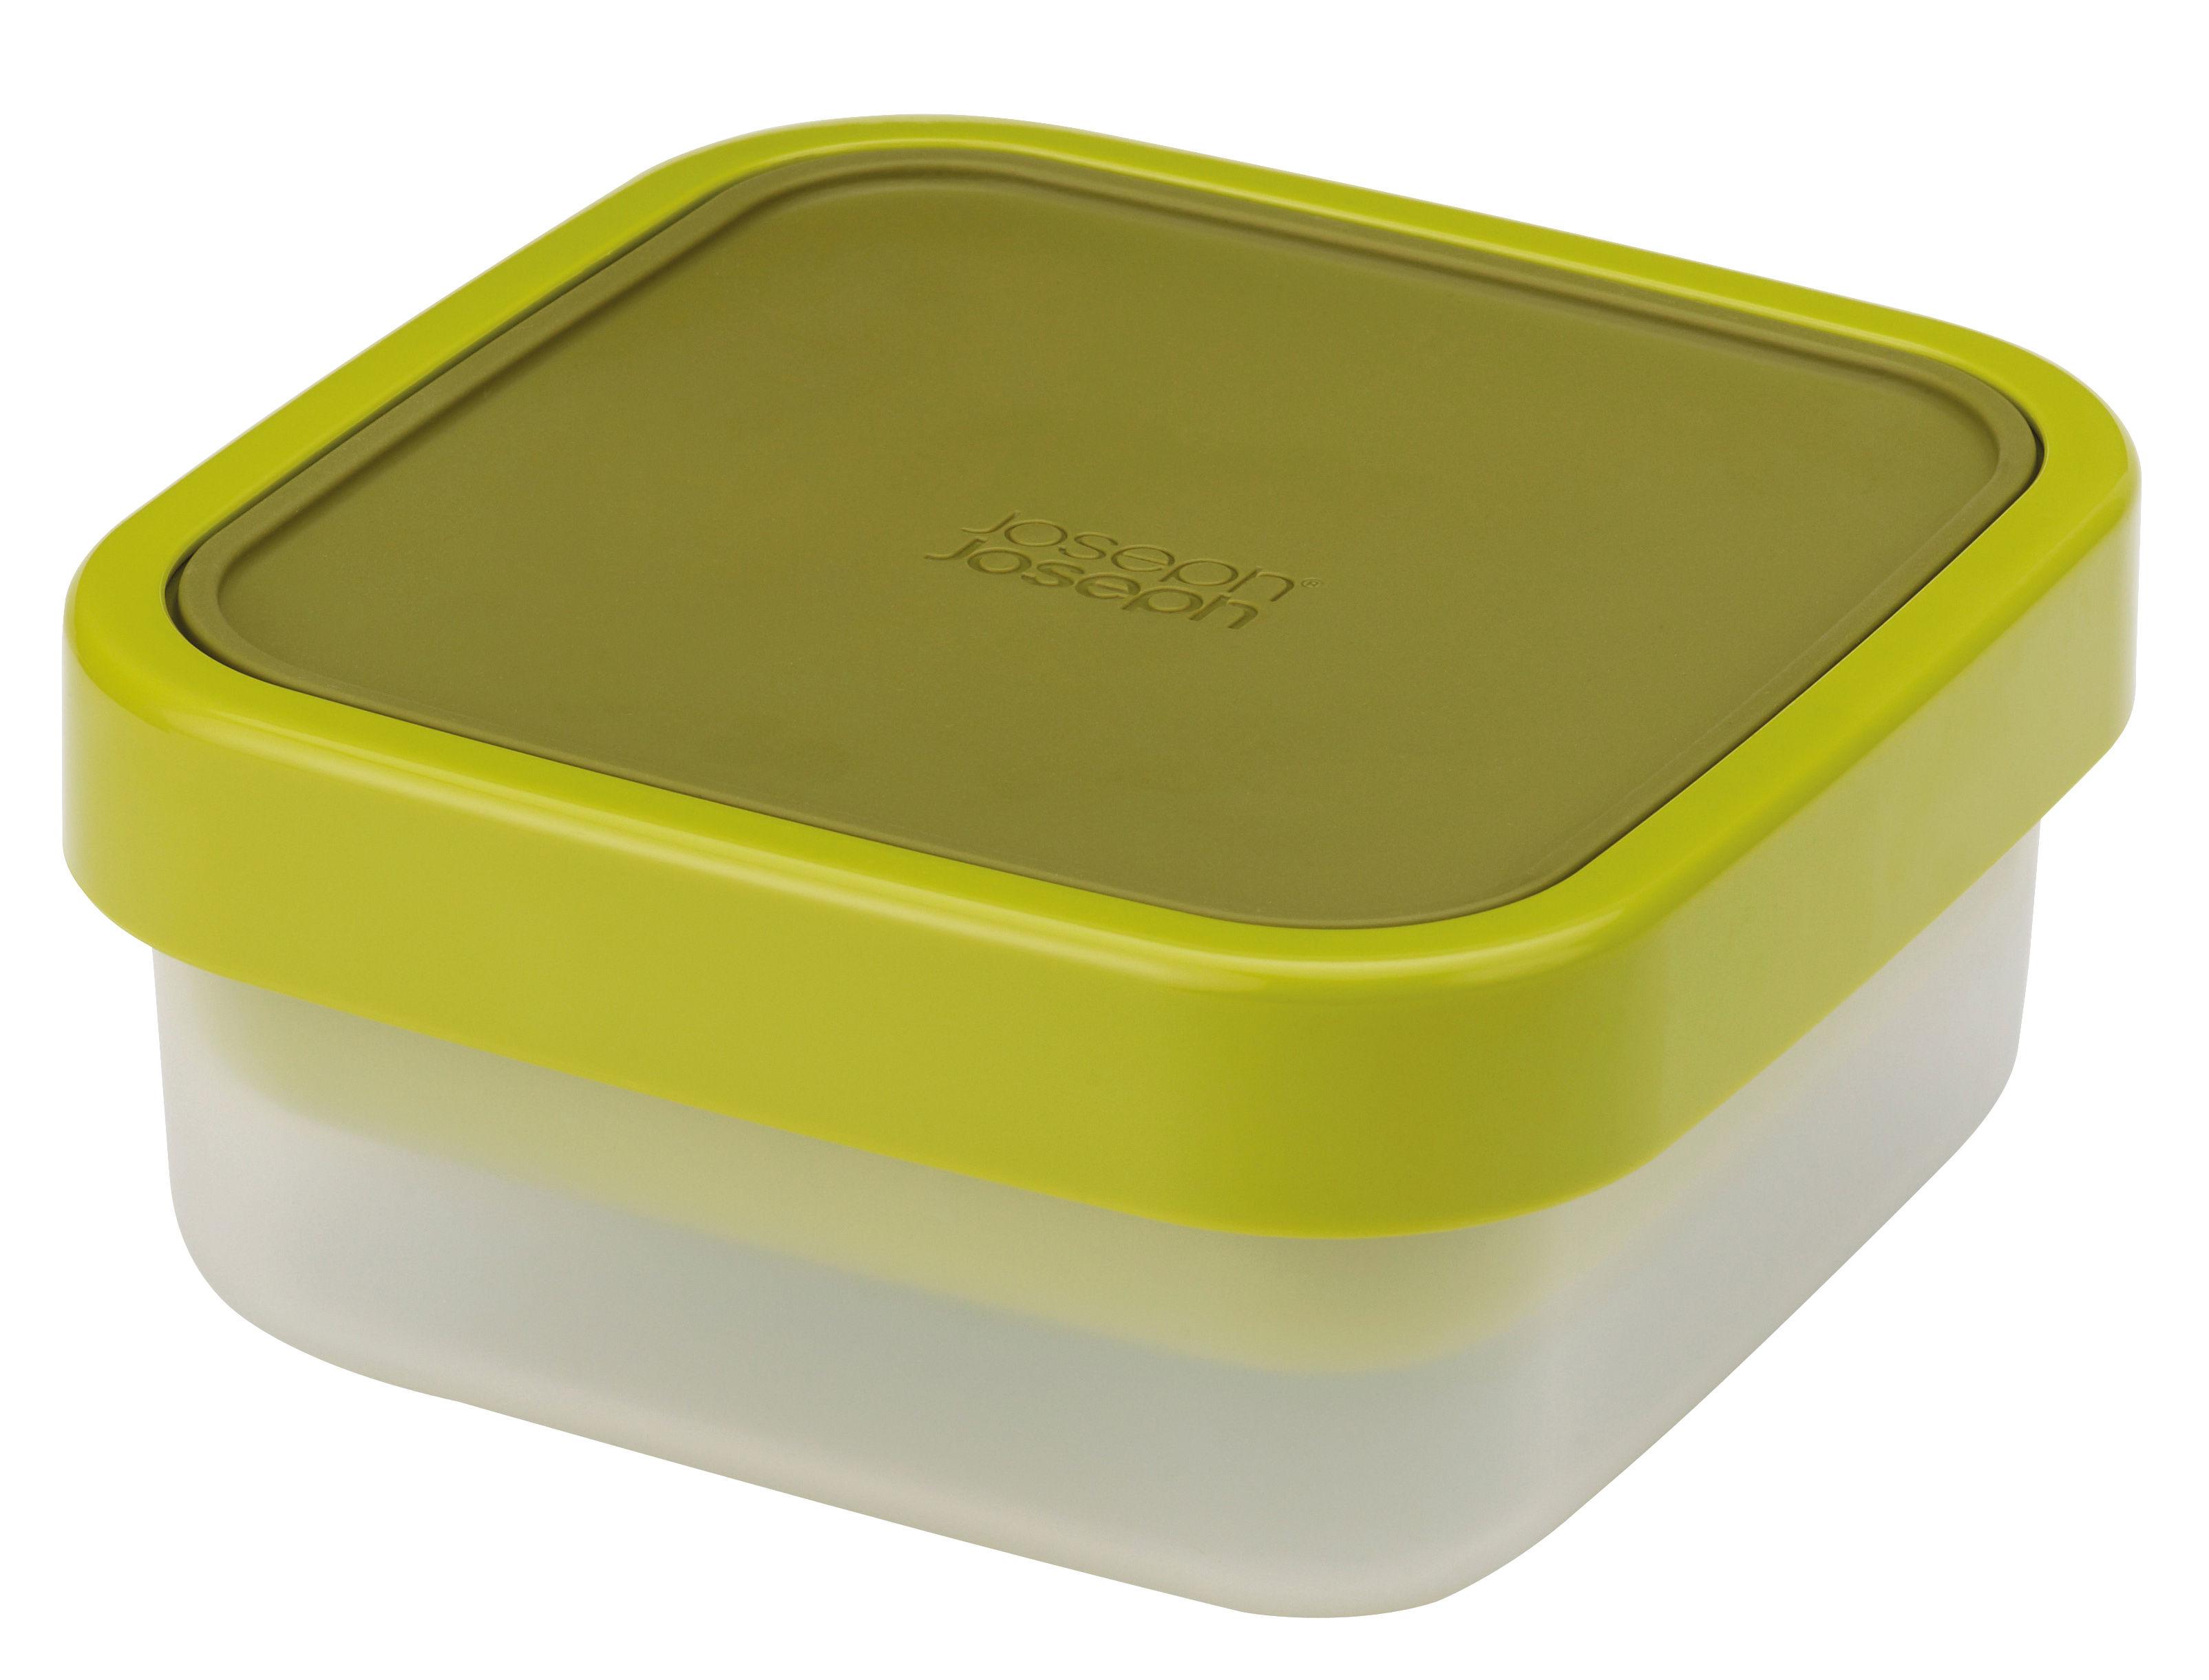 Kitchenware - Kitchen Storage Jars - GoEat Airtight box - Salad box - 2 stackable boxes by Joseph Joseph - Green - Polypropylene, Silicone